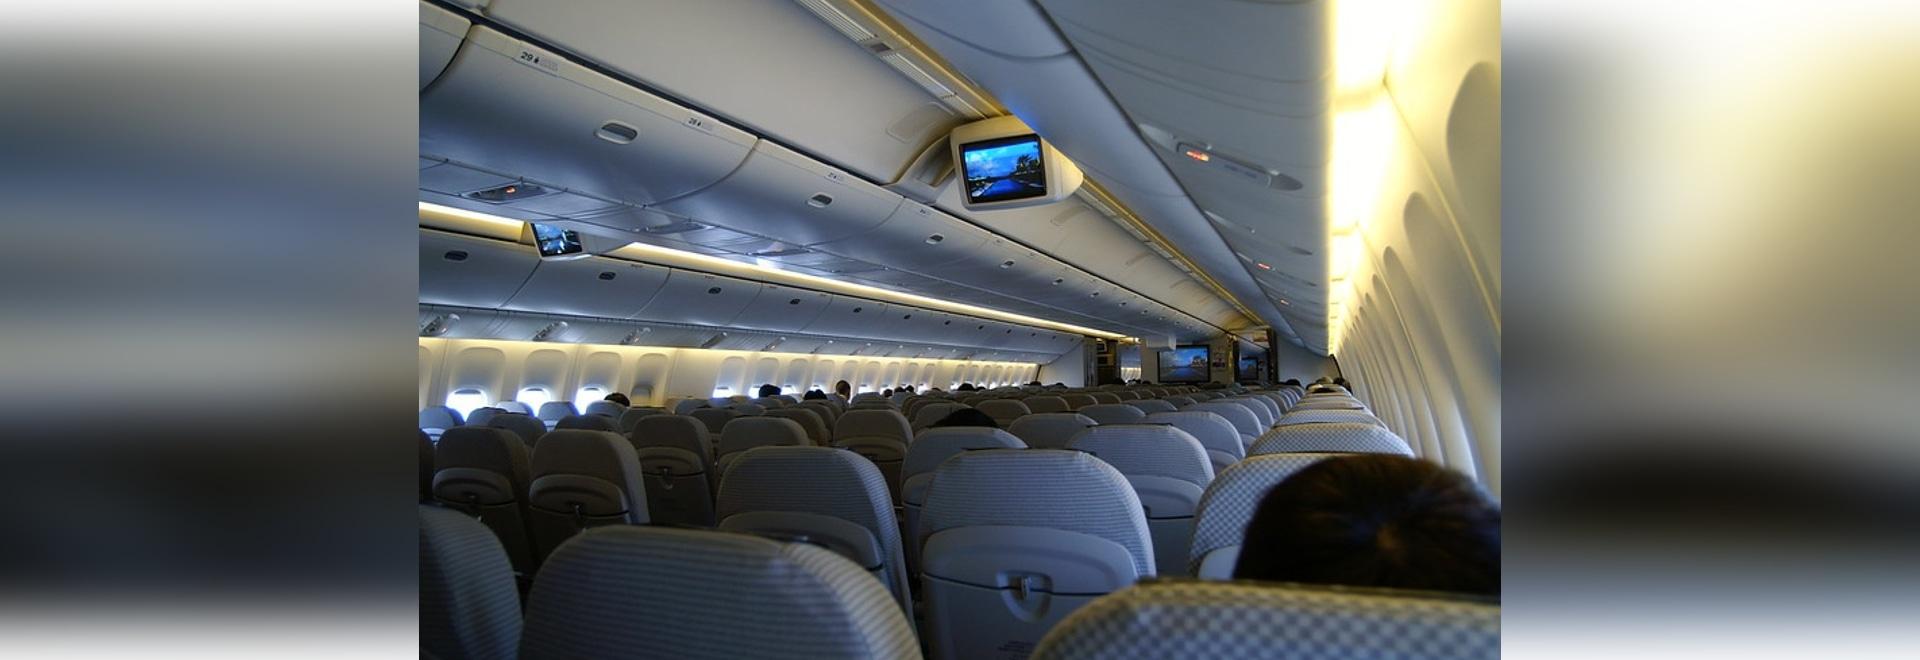 Dimer offers germ-killing robot to help airlines combat coronavirus